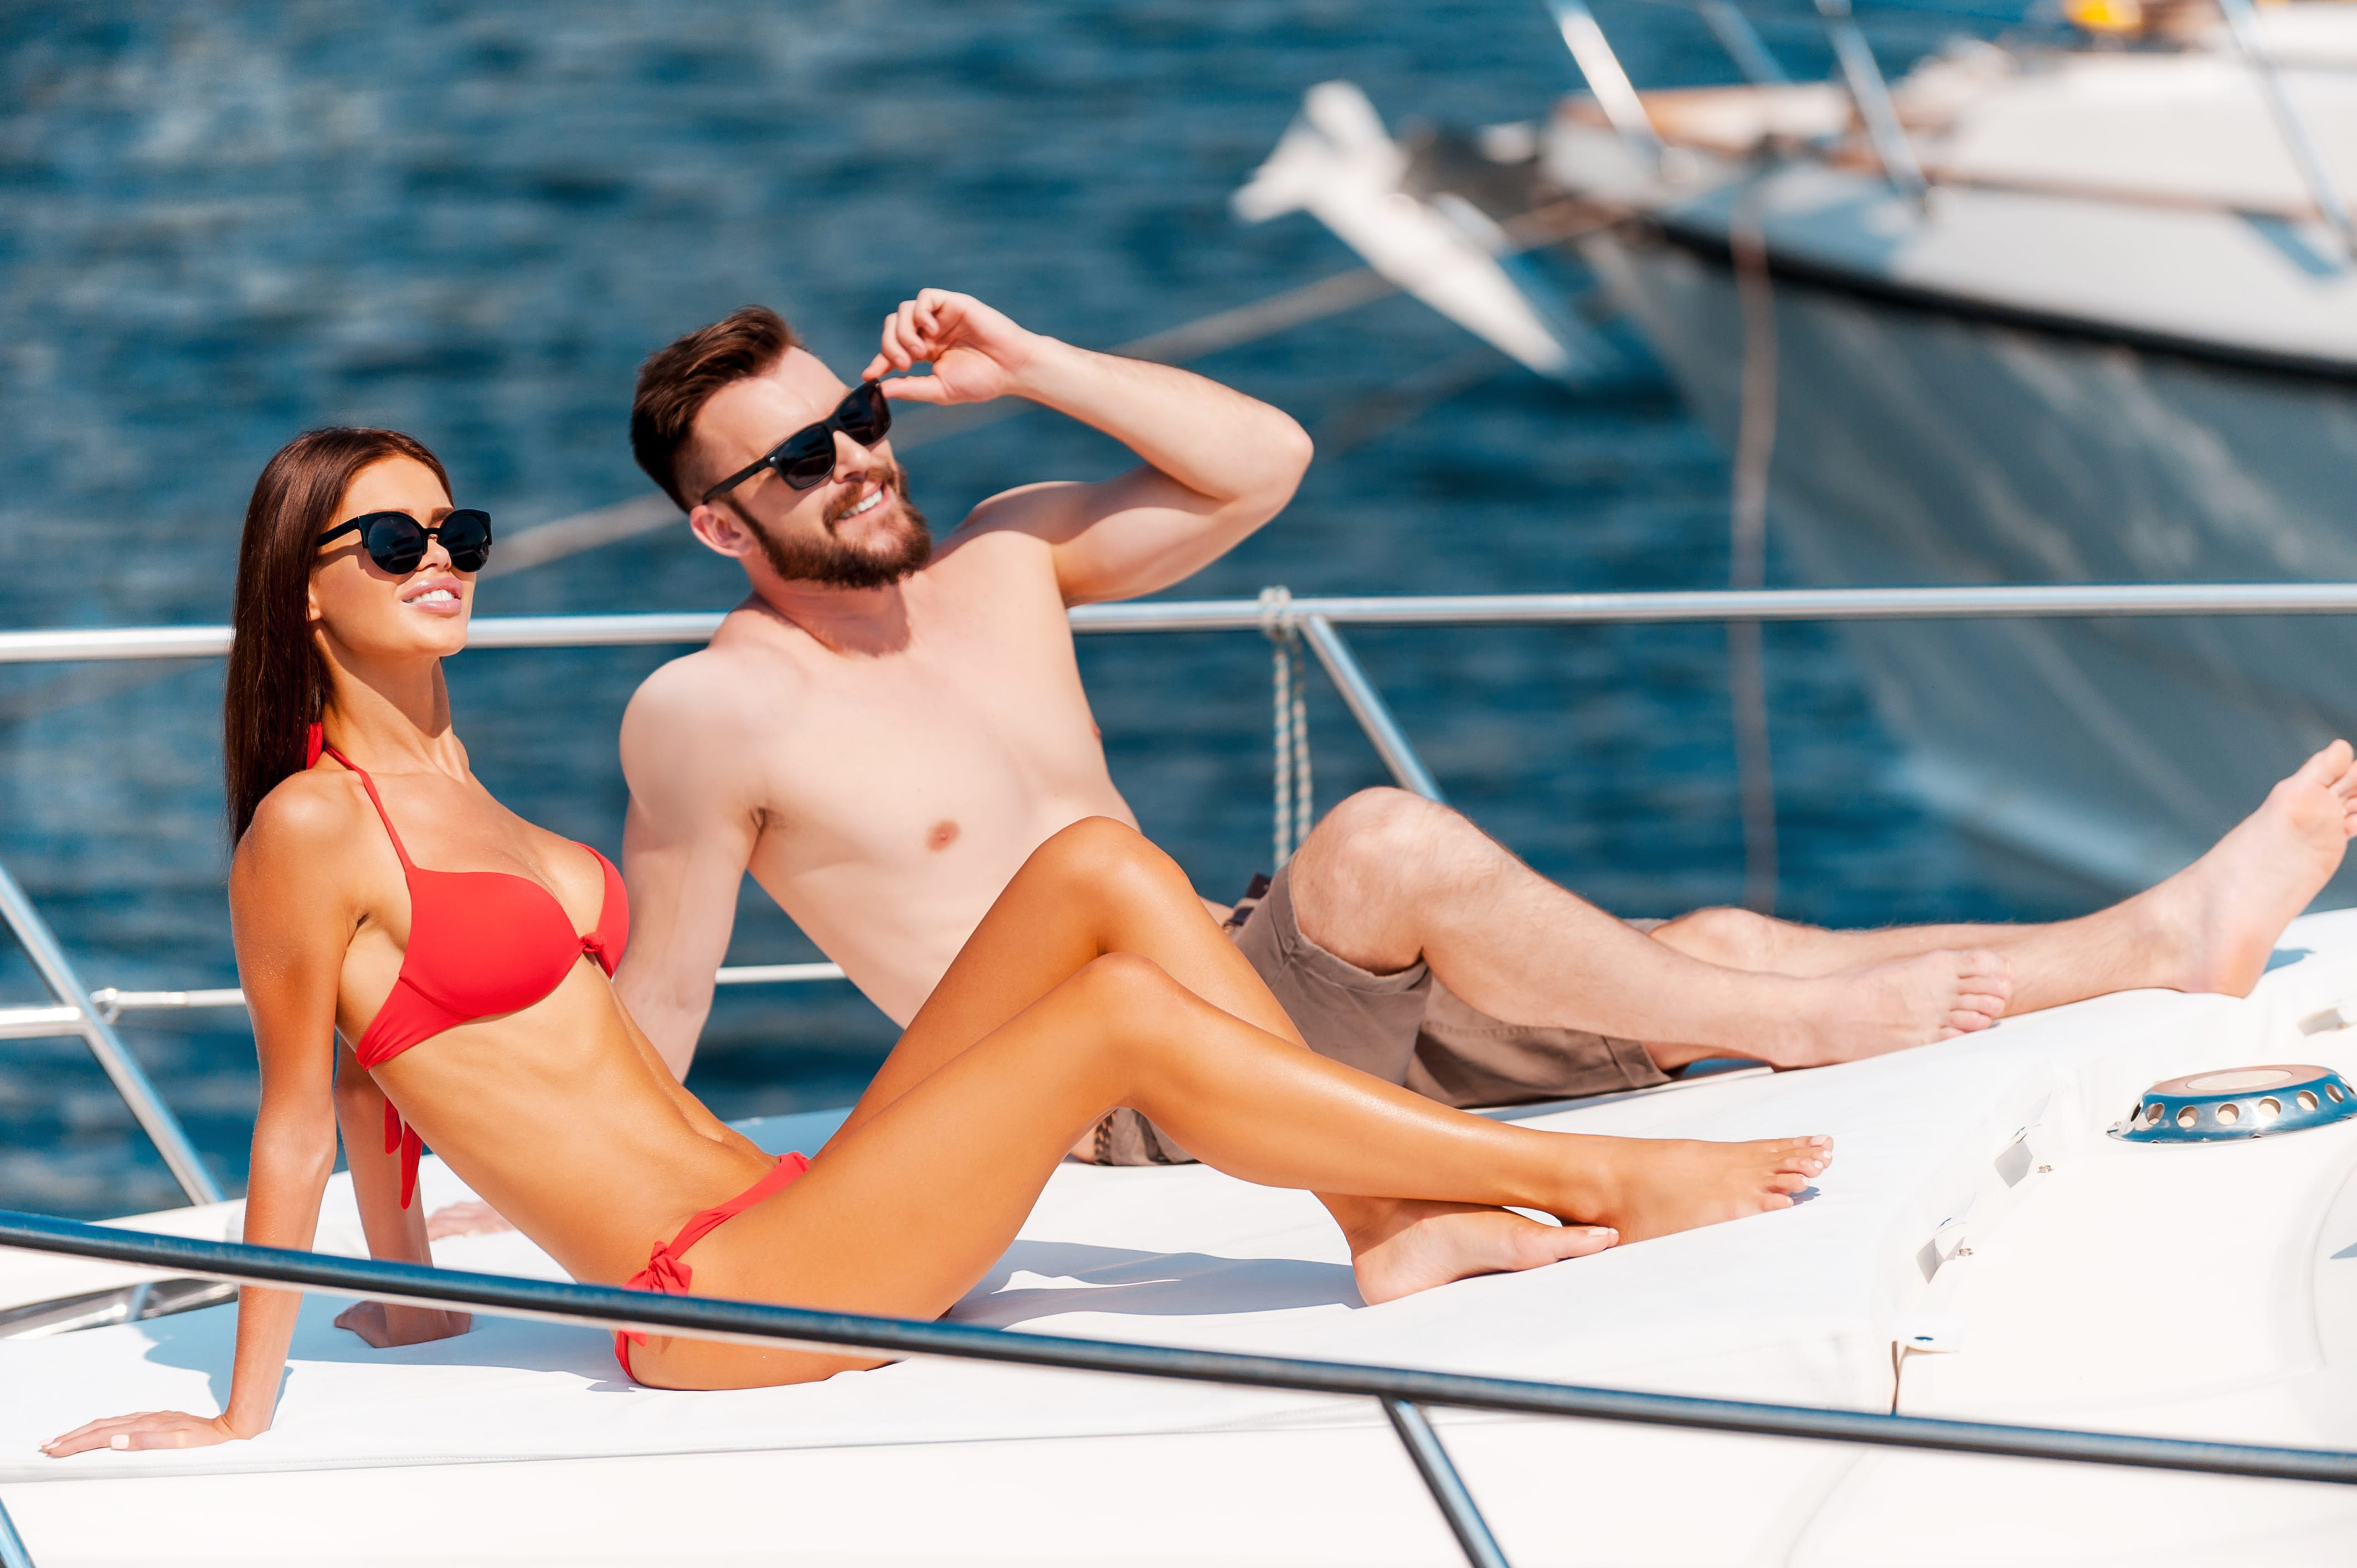 cayman-yacht-charter-cayman-yacht-rental-cayman-boat-charter-cayman-boat-rental-cayman-sailing-charter-